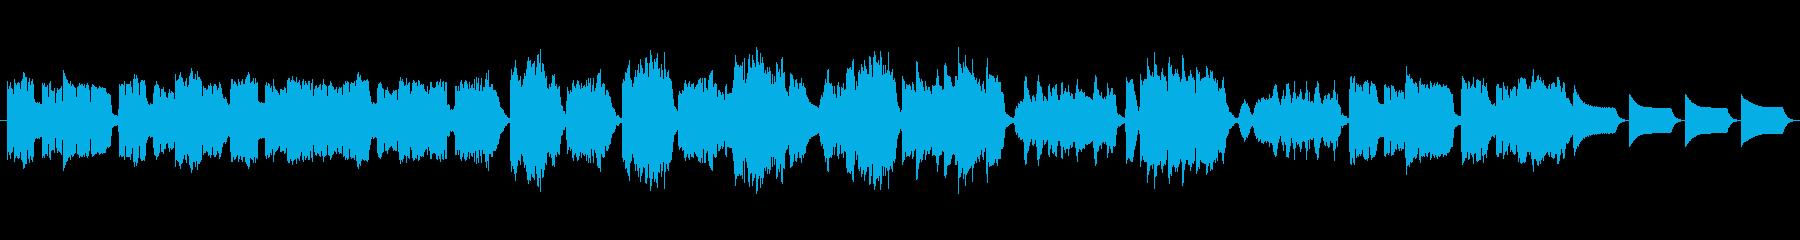 妖狐/電子楽器/和風/伝説/神秘的/村の再生済みの波形